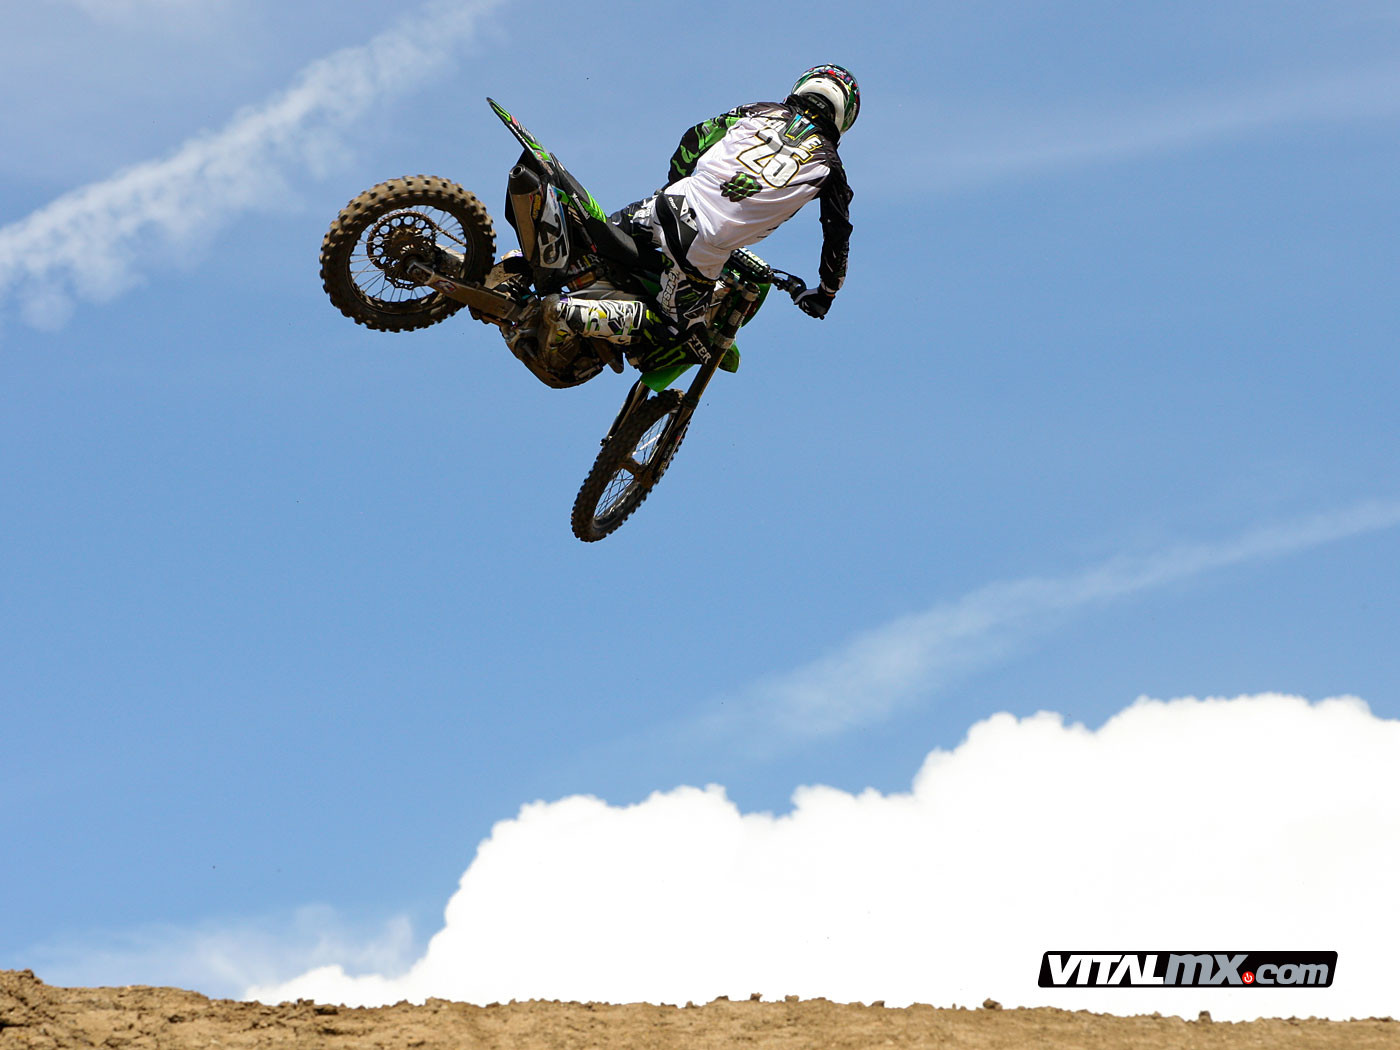 Pic o' The Day: Broc Tickle - Pic o' The Day: Broc Tickle - Motocross Pictures - Vital MX